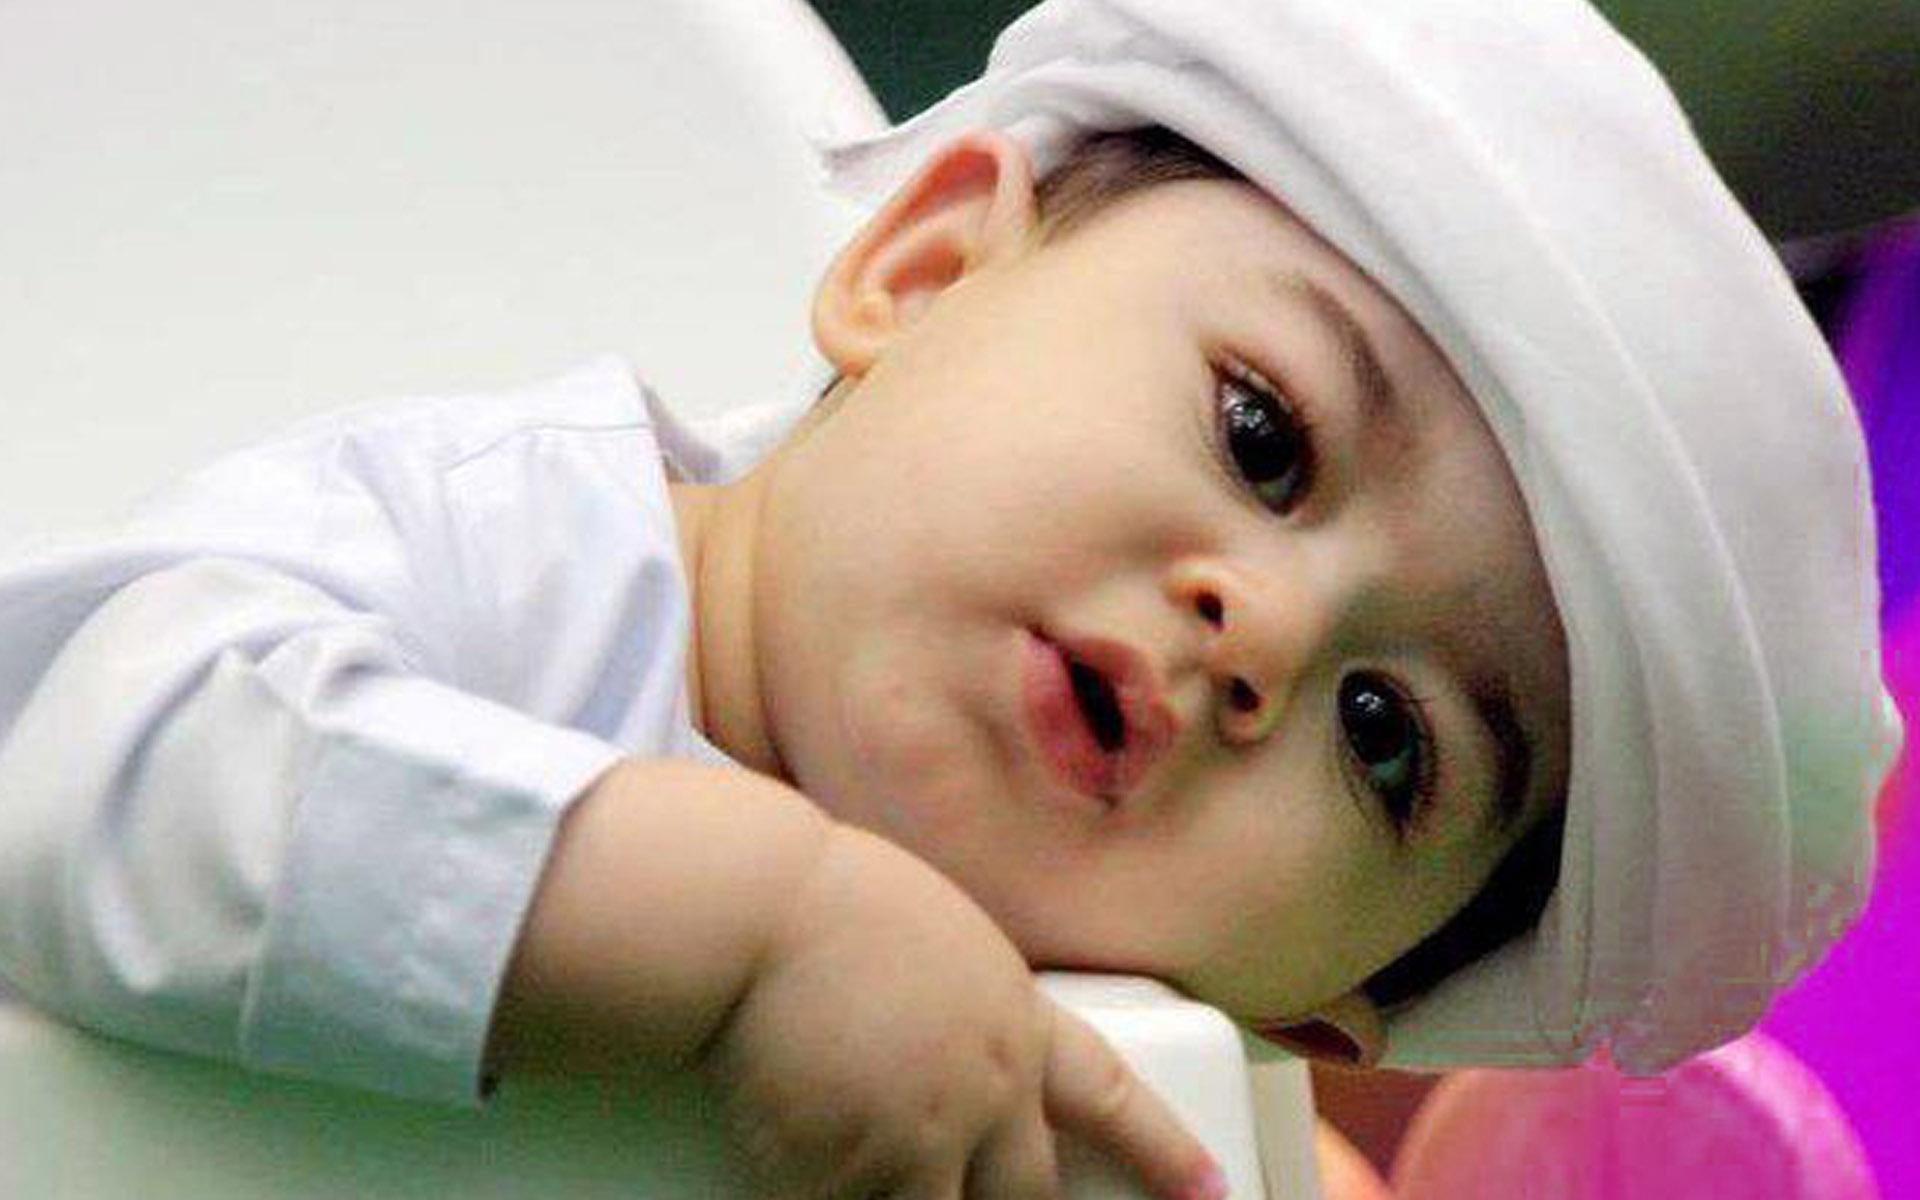 Cute Baby Boy Muslim HD Wallpaper For Desktop Background 1920x1200